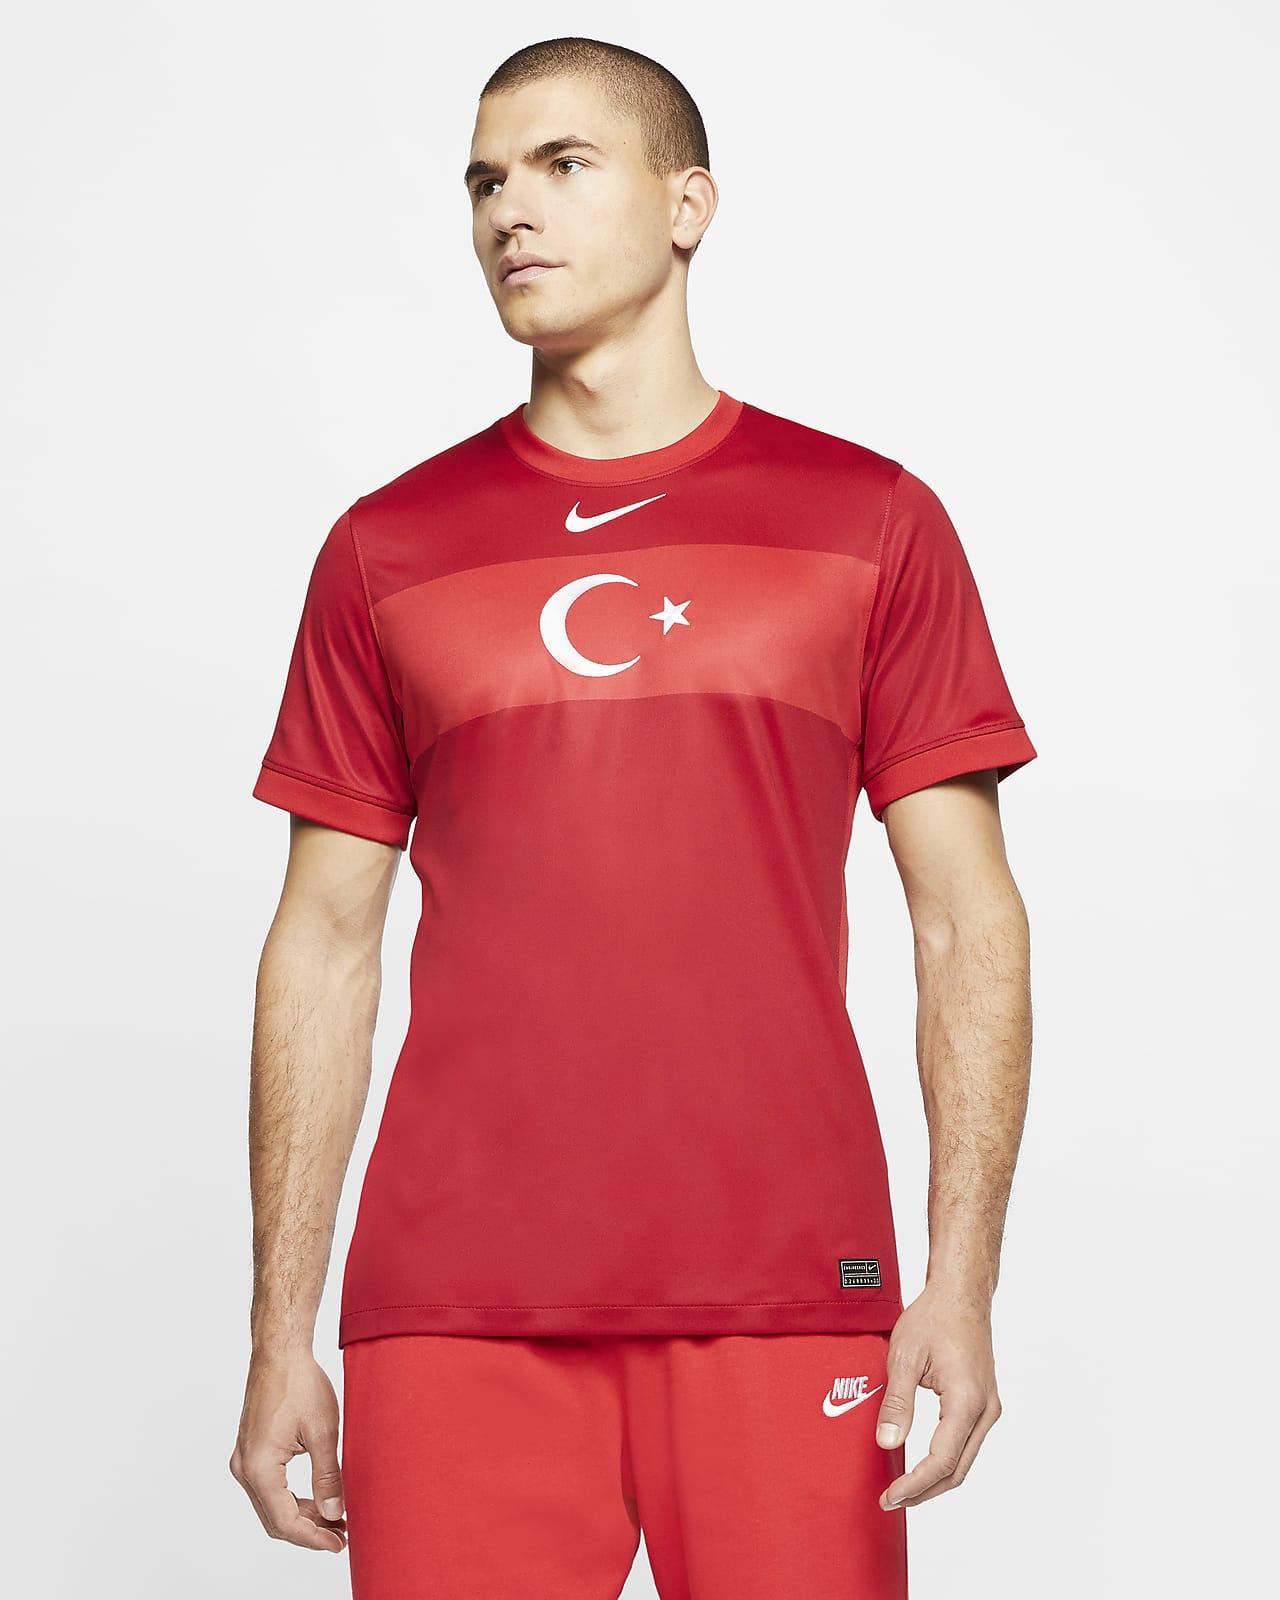 Palacio escalera mecánica Existencia  Camiseta de fútbol para hombre de visitante de Turquía 2020 Stadium. Nike CL